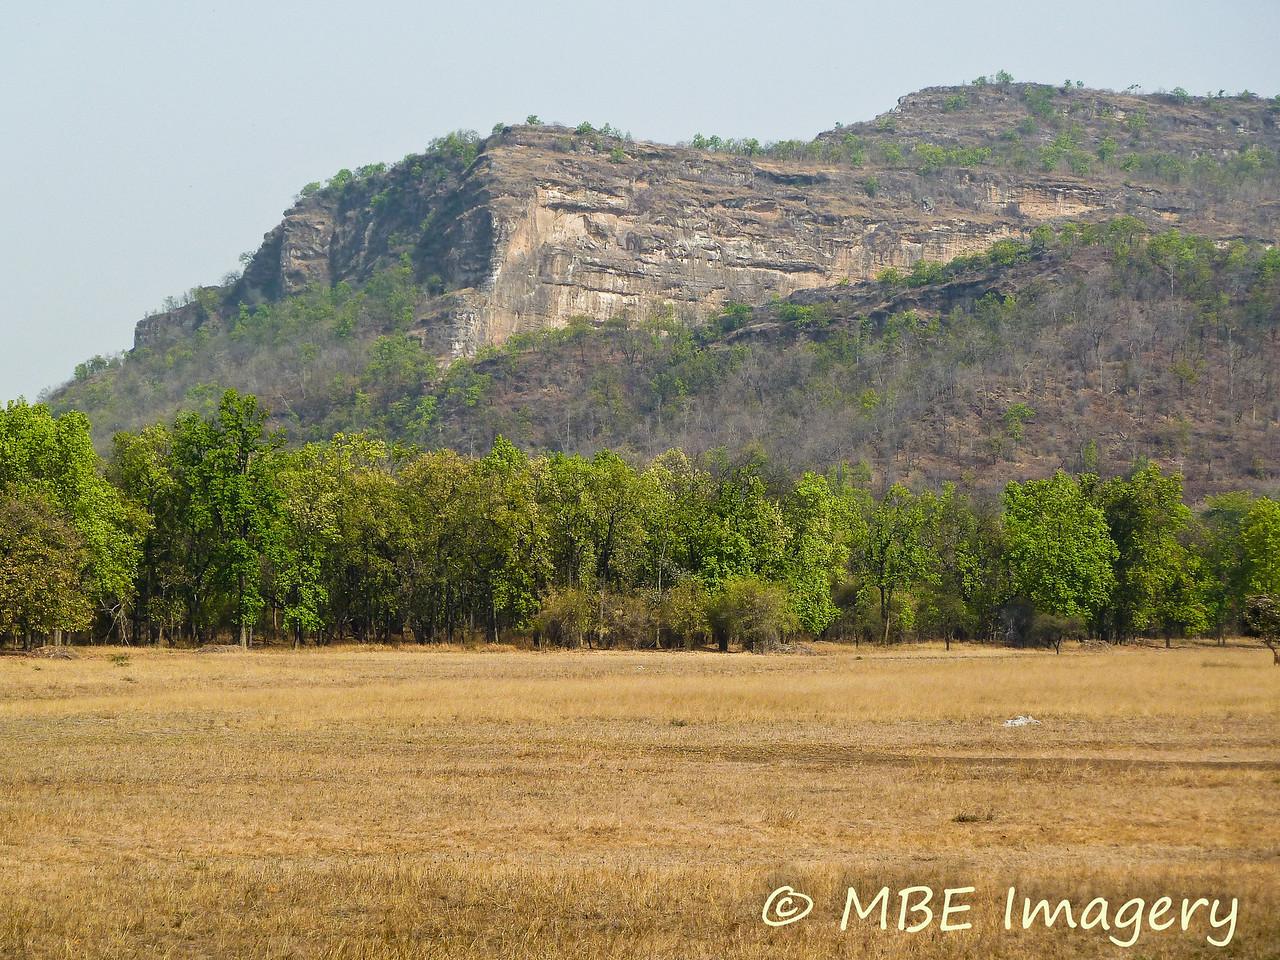 Rock outcropping at Bandhavgarh National Park